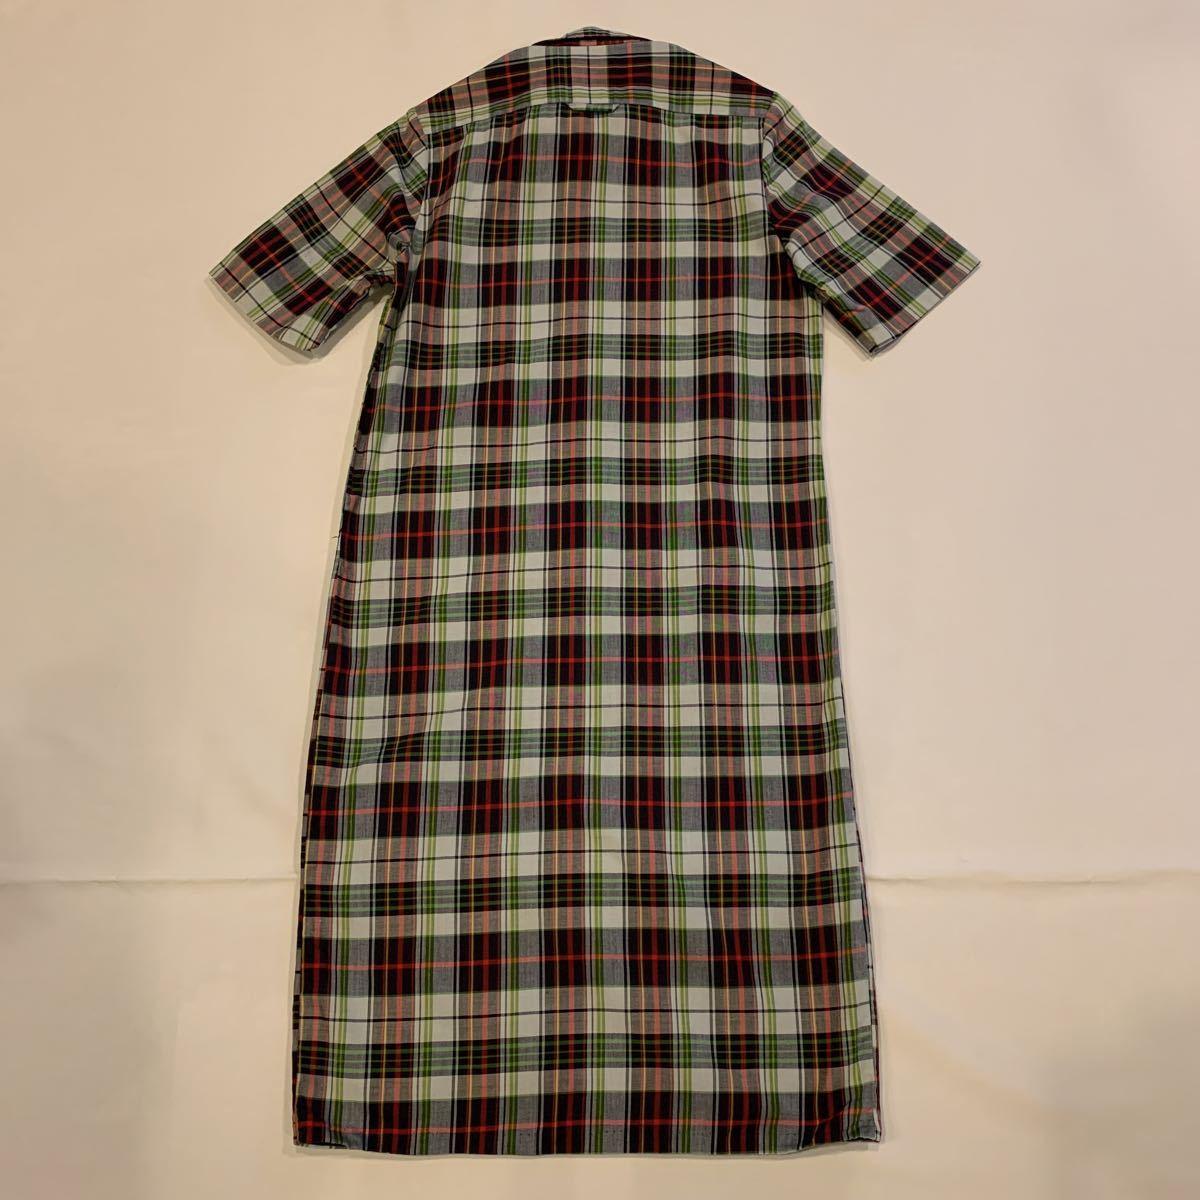 60s Maryery Zee MADRAS CHECK DRESS DEAD STOCK NOS ヴィンテージ ビンテージ マドラスチェック チェックワンピース デッドストック 50s_画像2